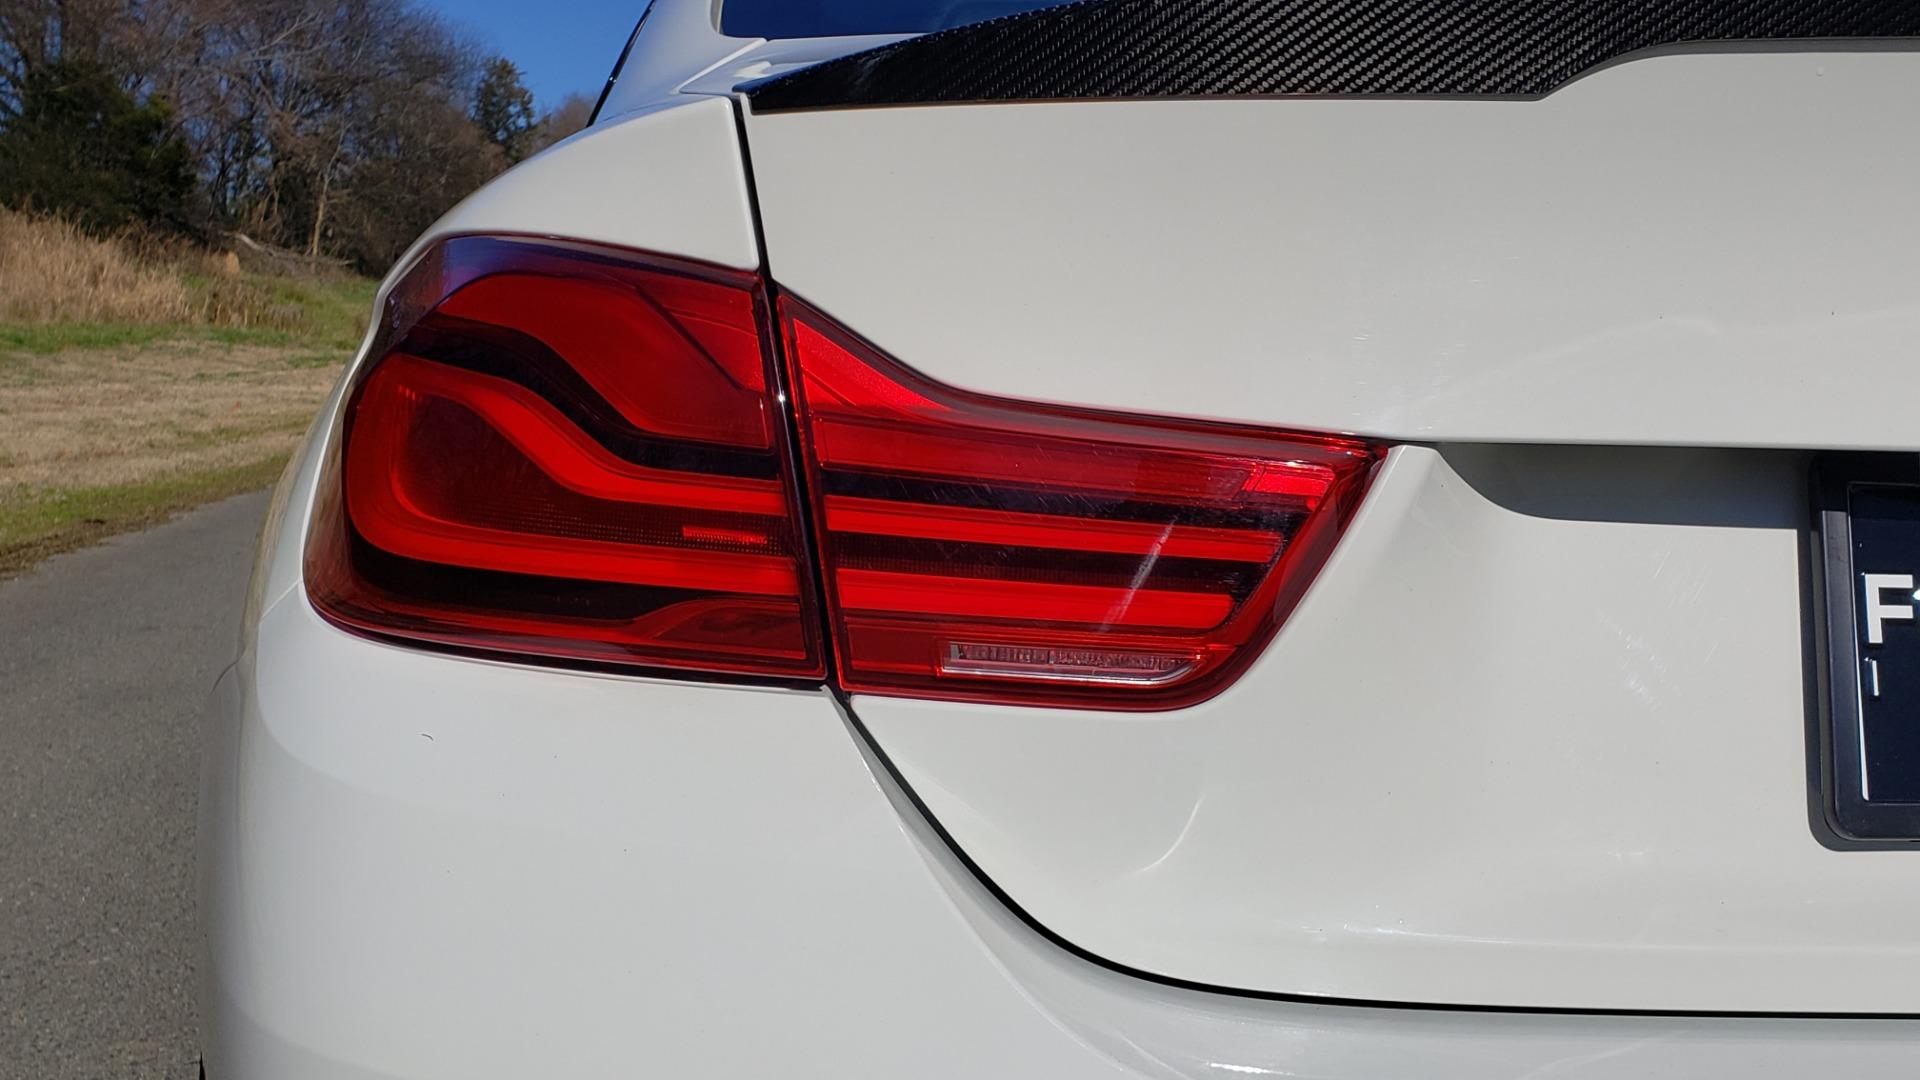 Used 2018 BMW M4 COMP PKG / EXEC / M-DRIVER / PARK CNTRL / ACTIVE BLIND SPOT for sale Sold at Formula Imports in Charlotte NC 28227 28